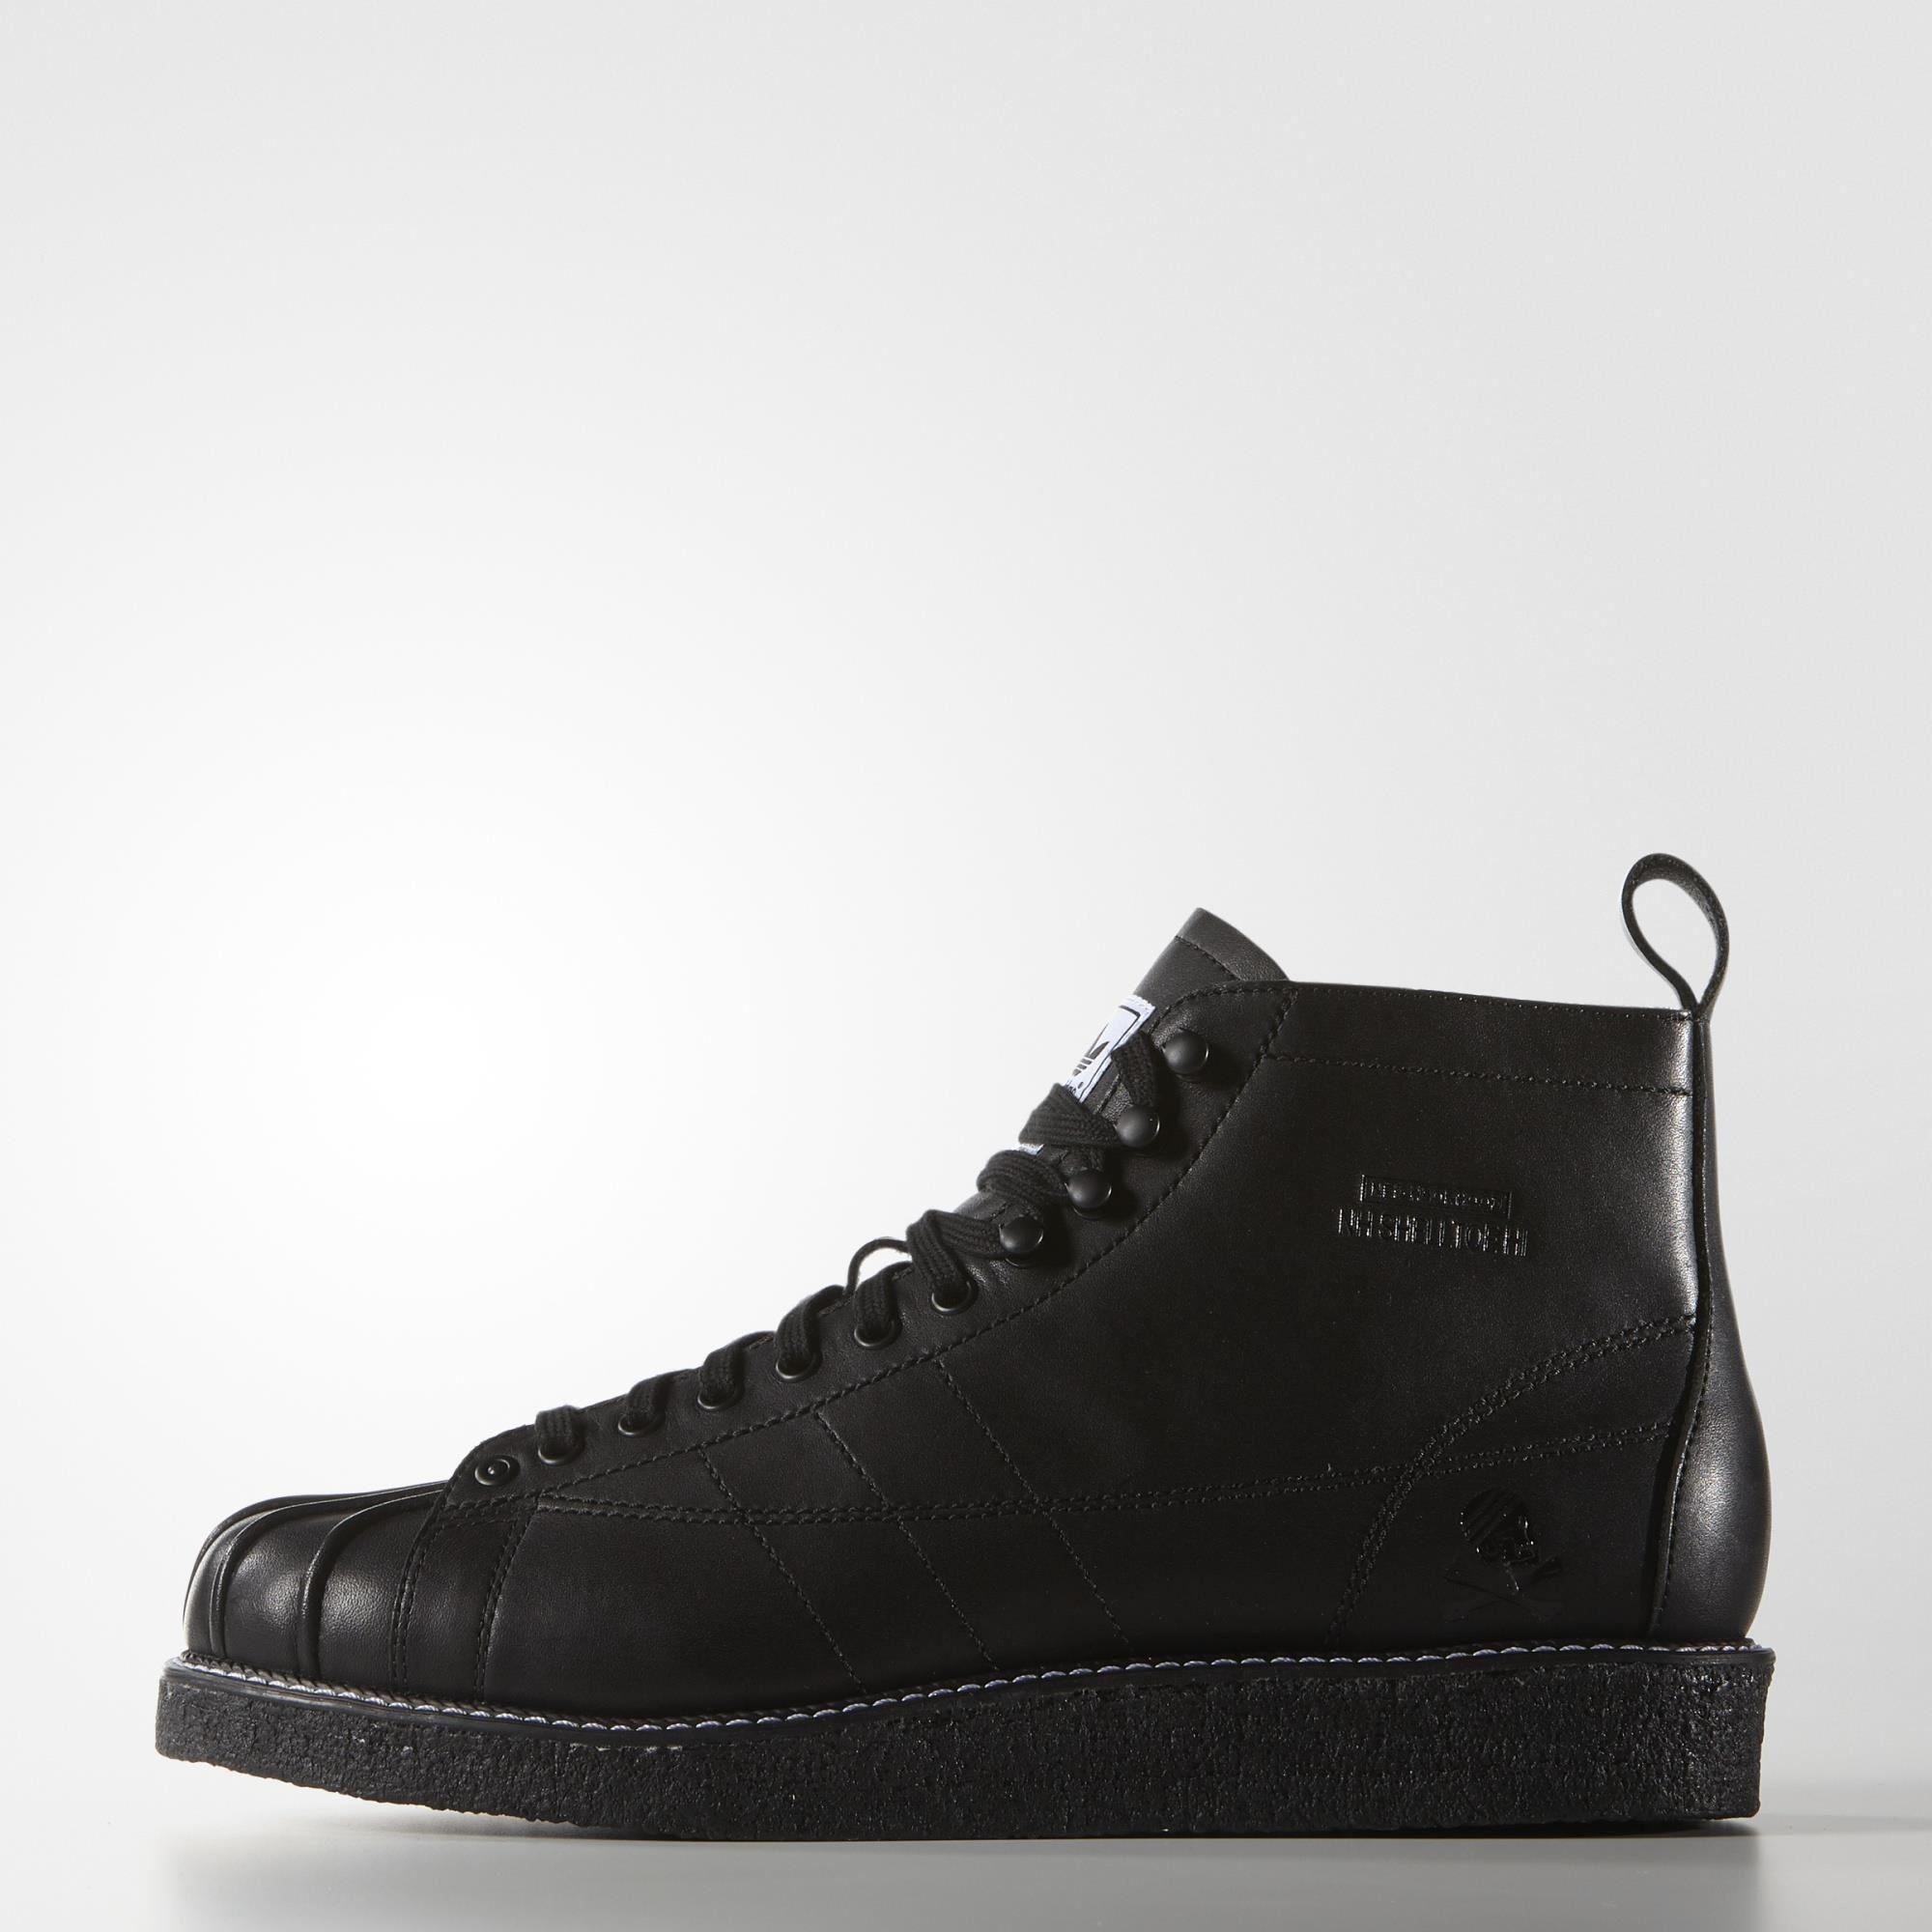 new arrival ae68a 63901 Adidas Neighborhood Shell-Toe Boots | footwear | Adidas shoes, Black ...